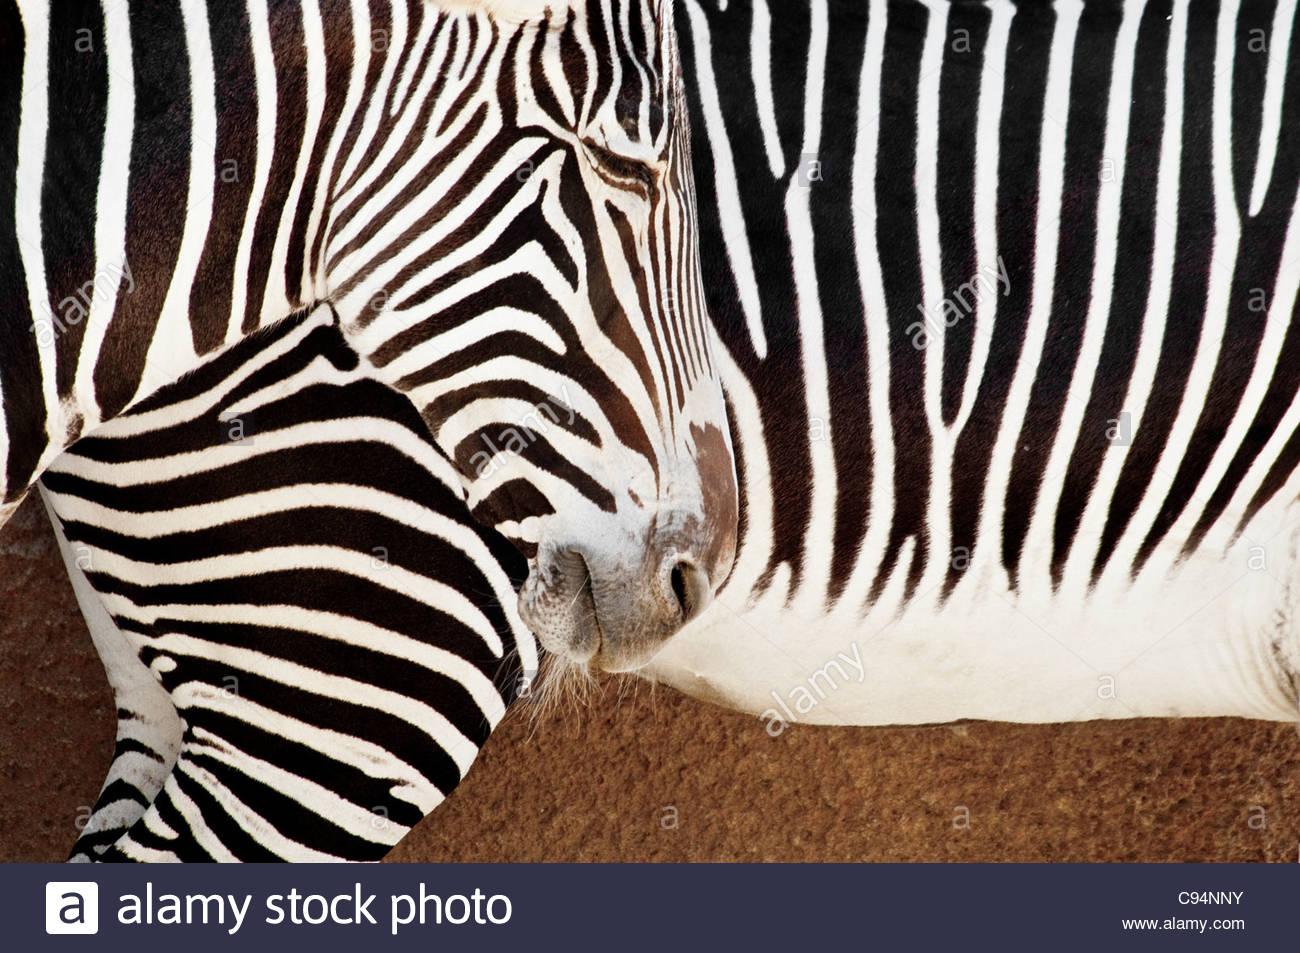 Close-up of Zebra Pattern, Grevy's Zebra, Equus grevyi, Los Angeles Zoo, Los Angeles, California, USA - Stock Image